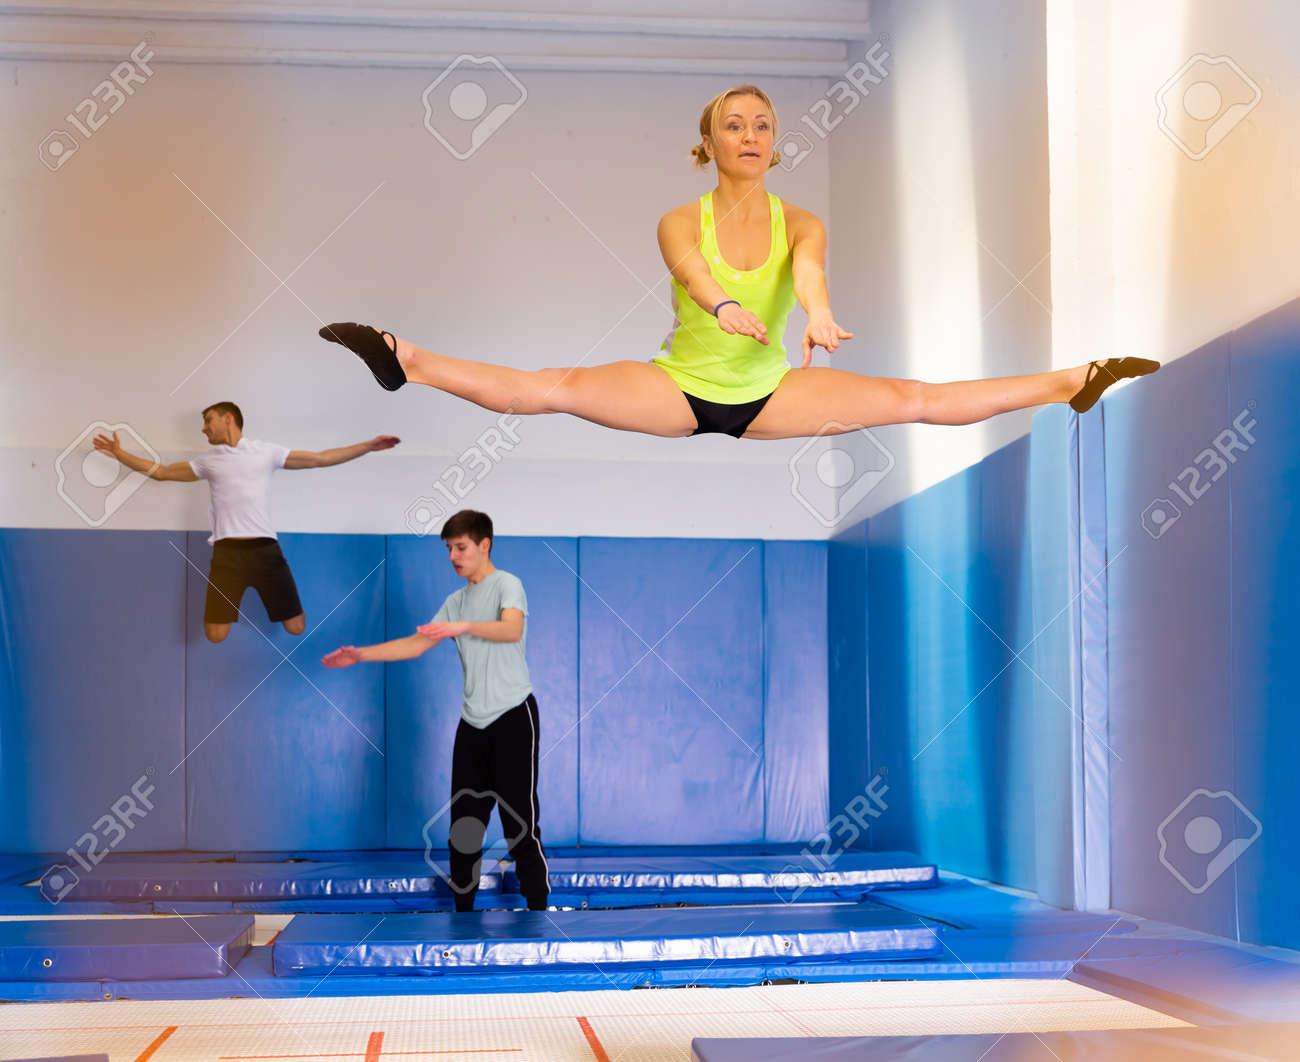 Woman training in trampoline center - 158714085